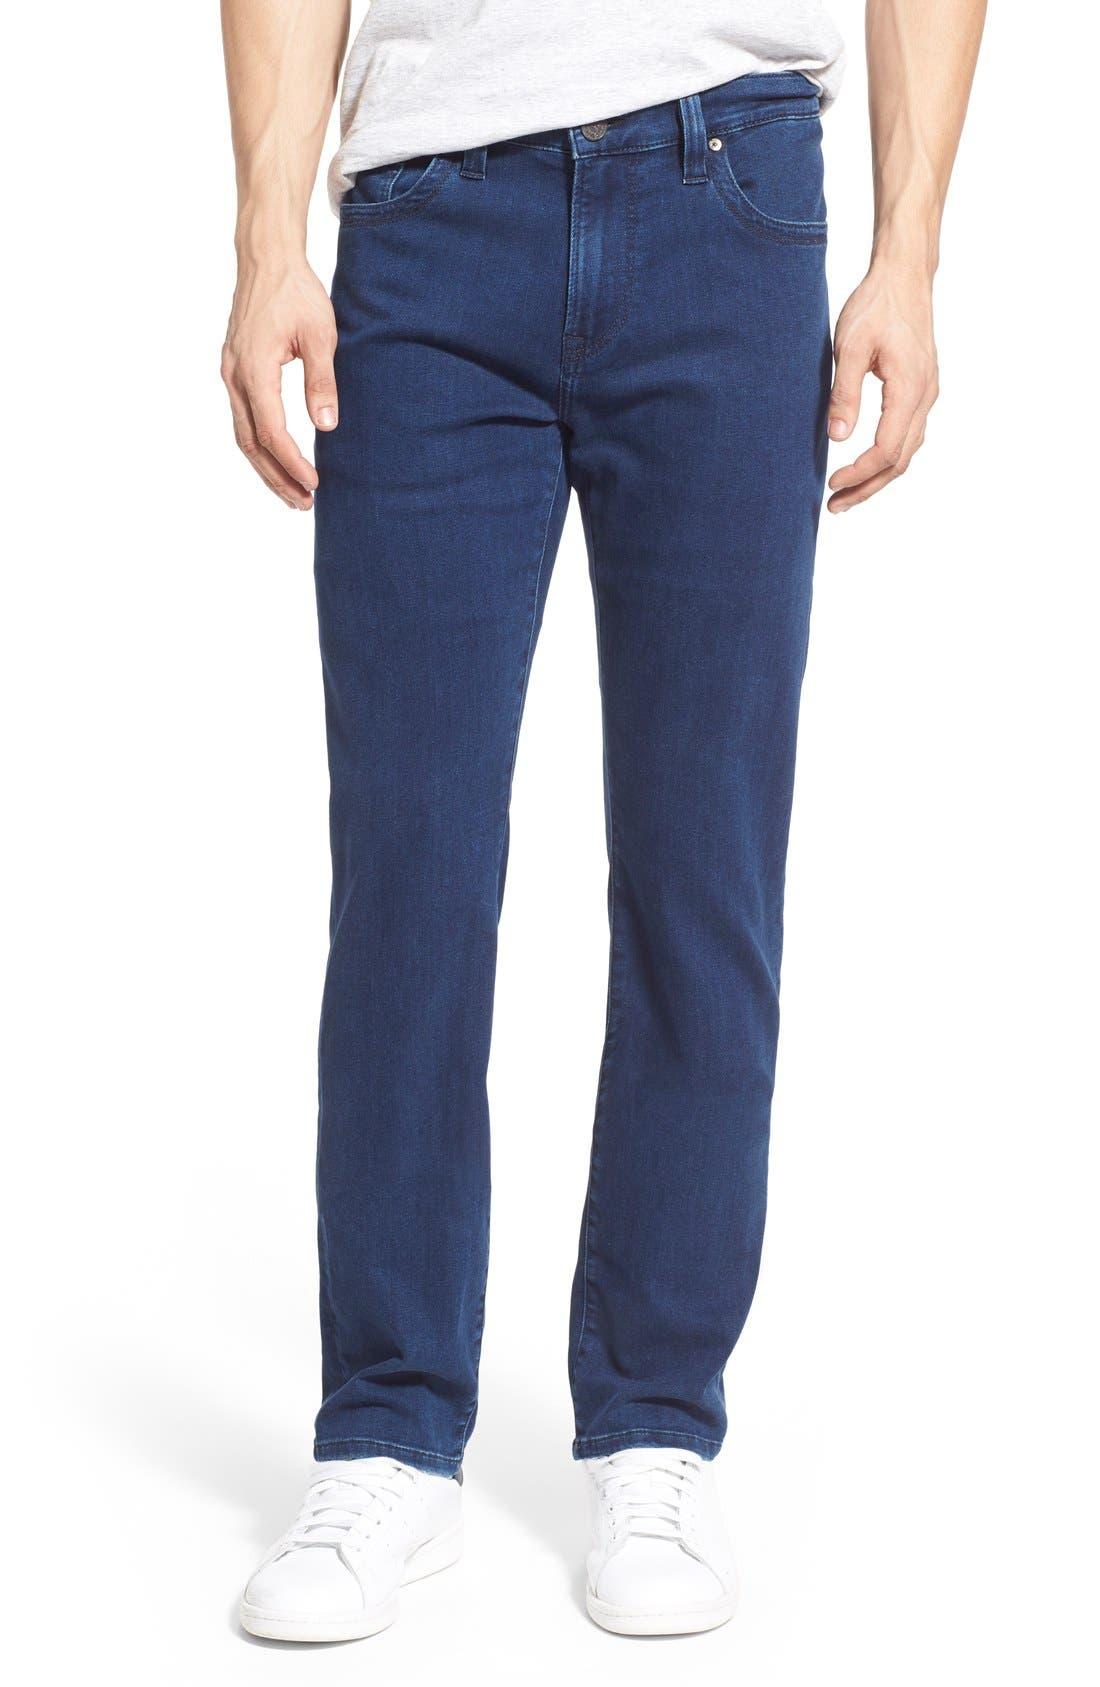 'Courage' Straight Leg Jeans,                         Main,                         color, Midnight Light Denim